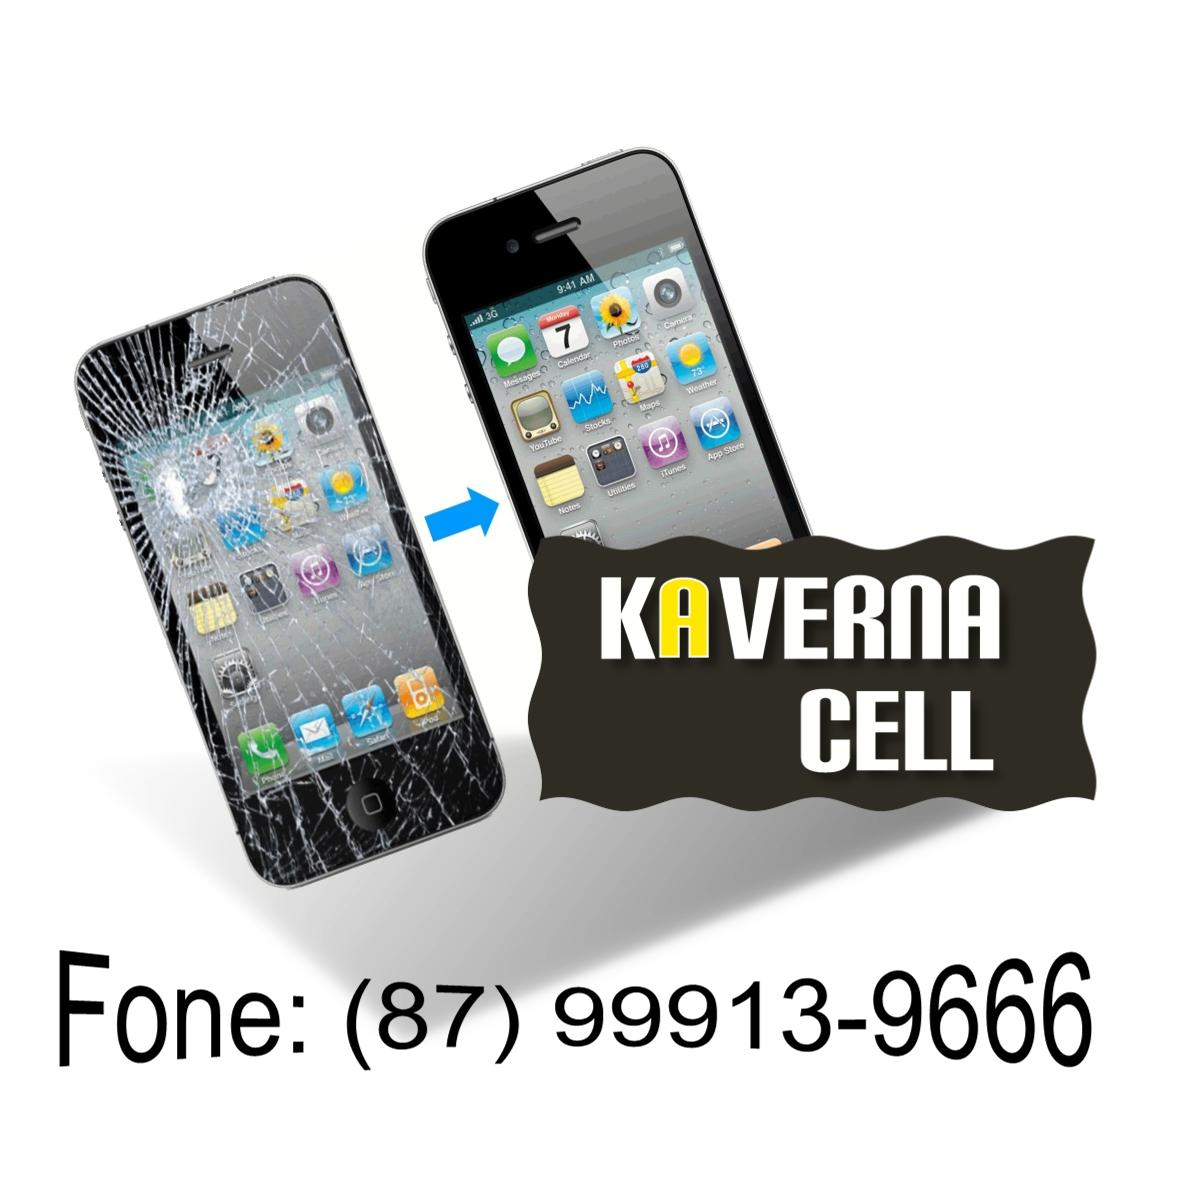 KAVERNA CELL